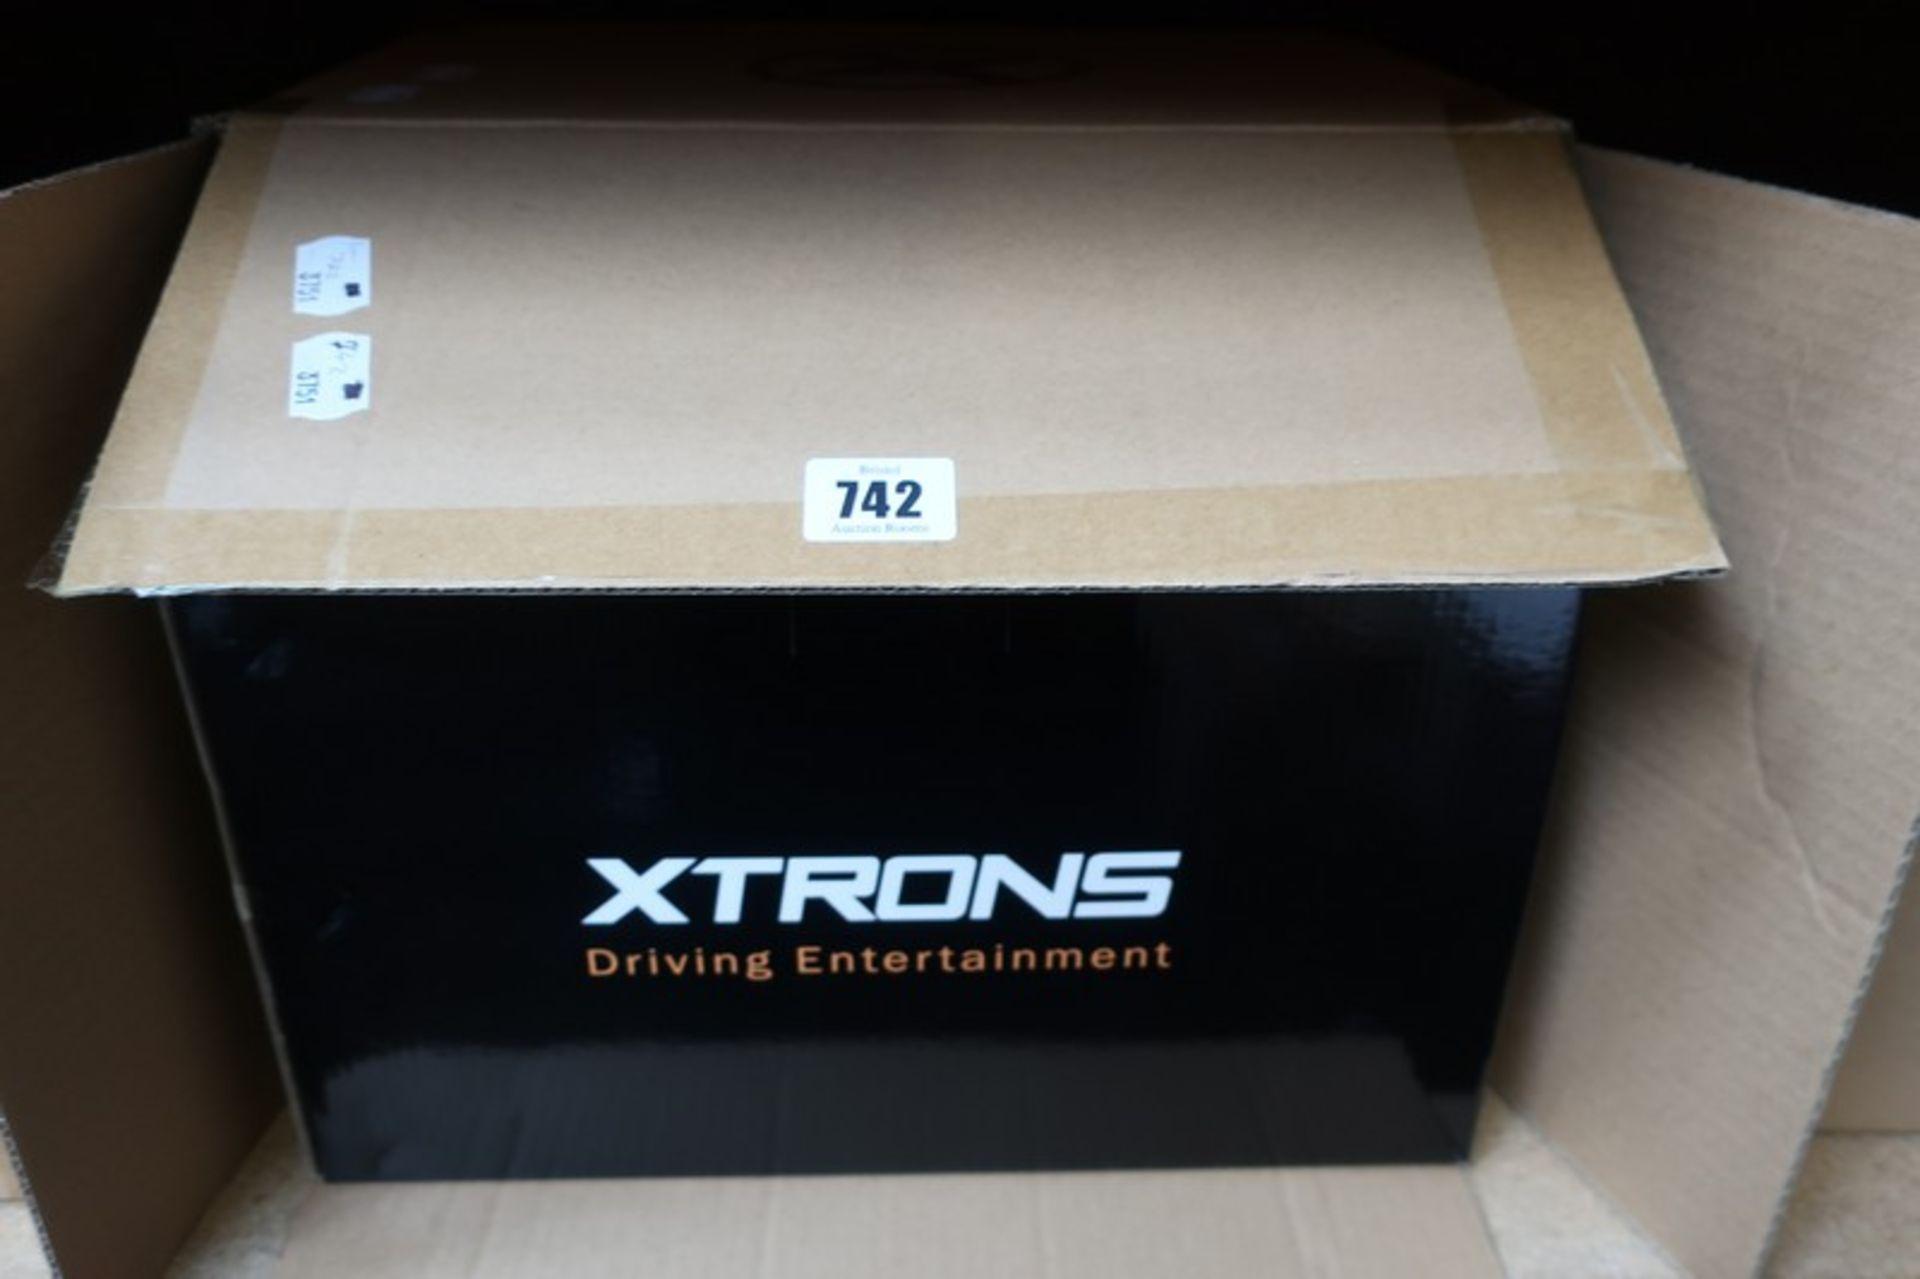 Lot 742 - A boxed as new Xtrons ICE/HU/PE9853BPL Android 8.0 Octa Core 4GB RAM + 32GB ROM multimedia car